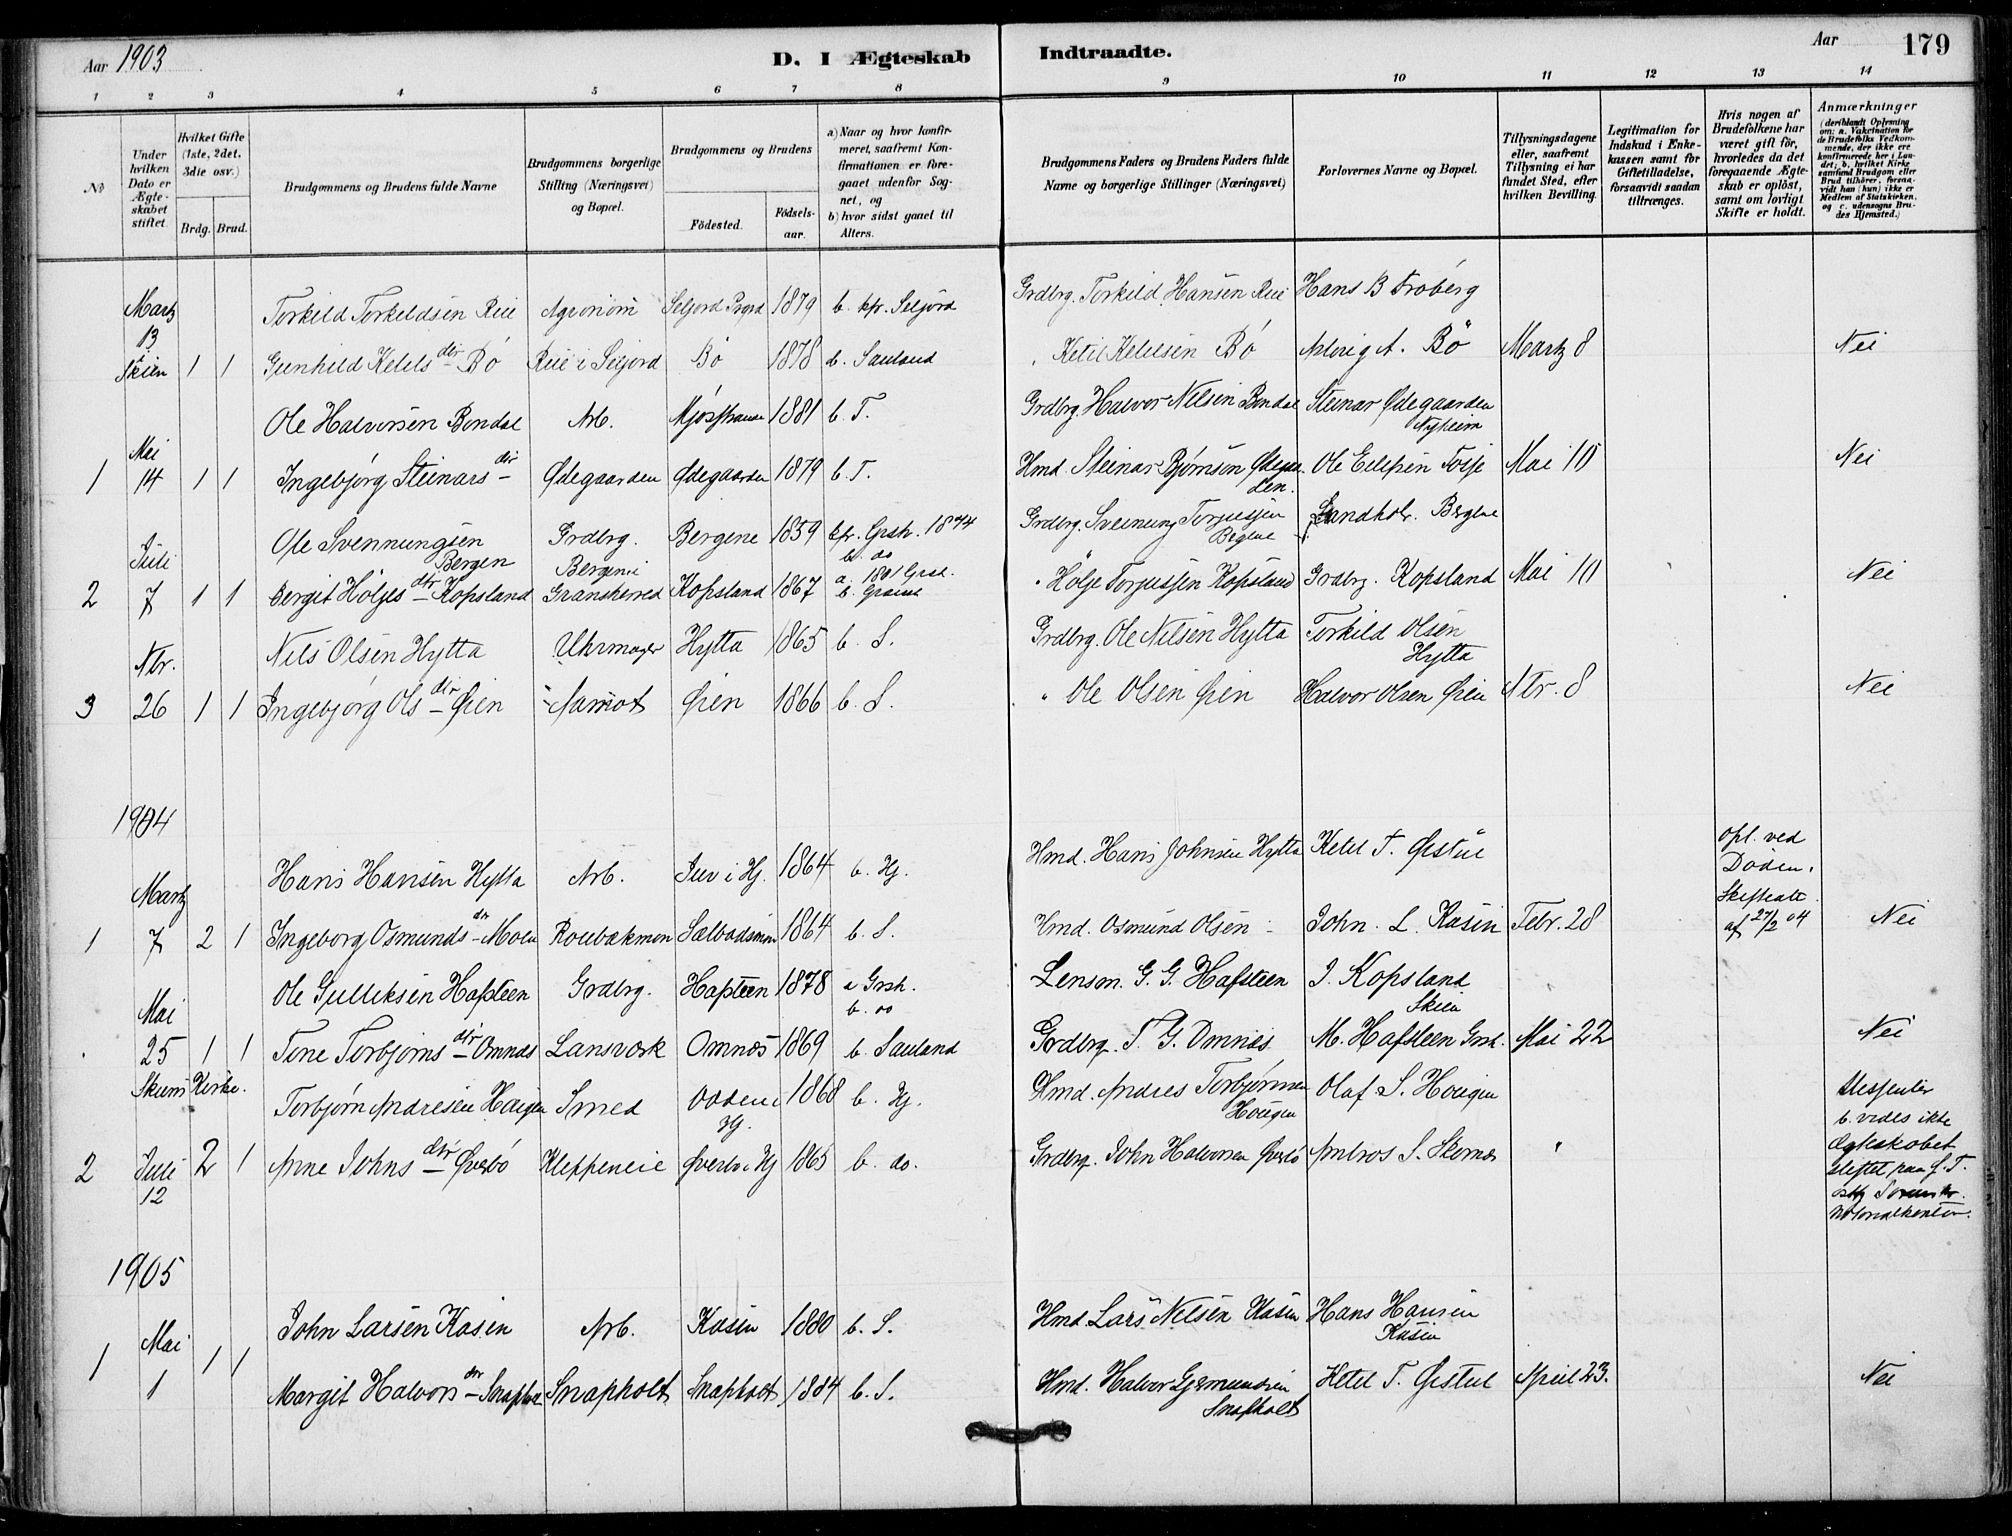 SAKO, Hjartdal kirkebøker, F/Fb/L0002: Ministerialbok nr. II 2, 1880-1932, s. 179